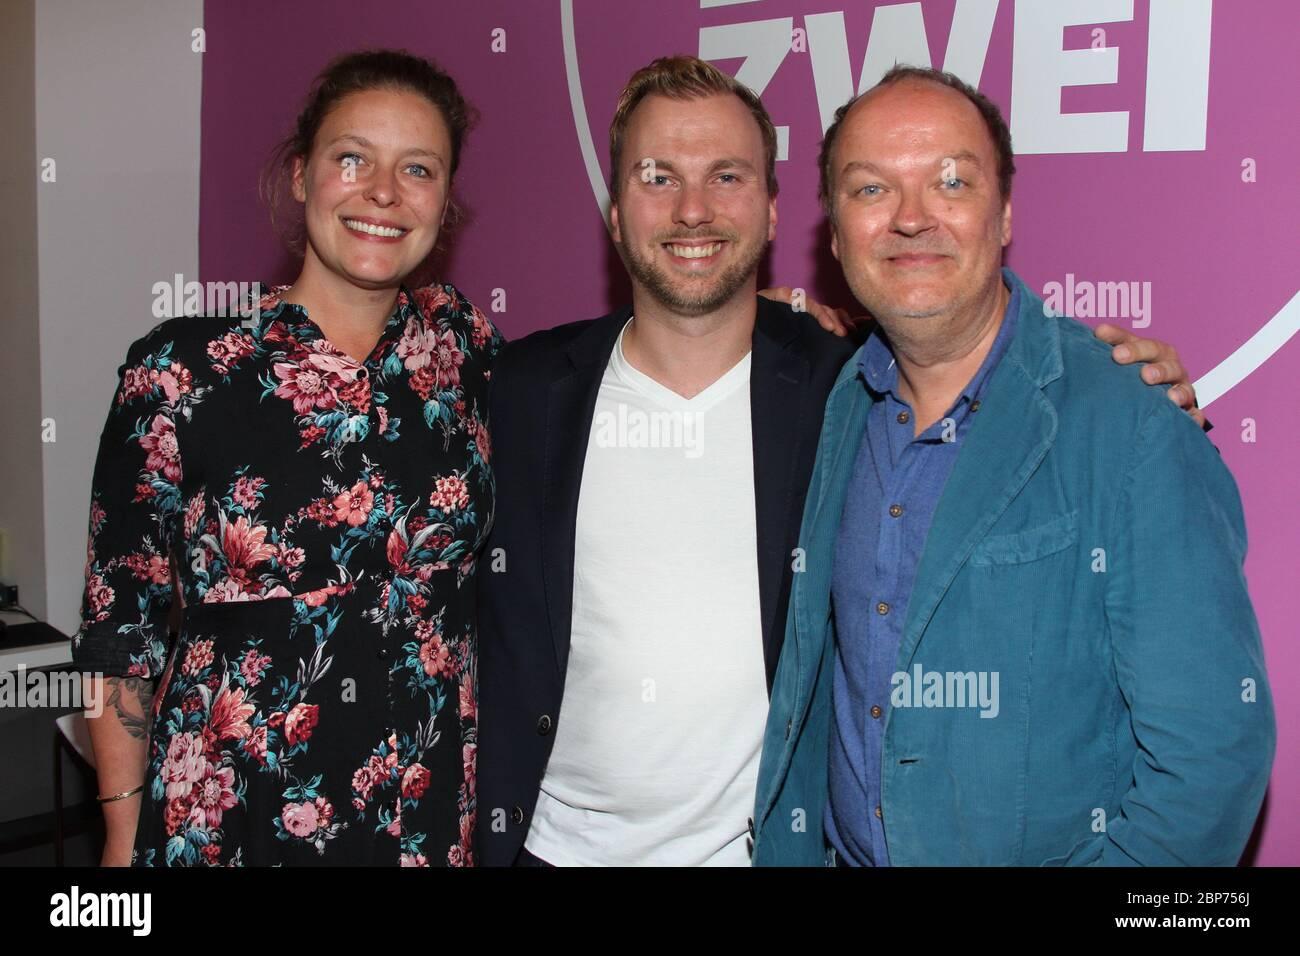 Cathy Weder, Jens Wawrzeck, Fabian Kuehne, Fototermin im Hamburg Zwei 80er Cafe à Ottensen, Hambourg, 15.08.2019 Banque D'Images